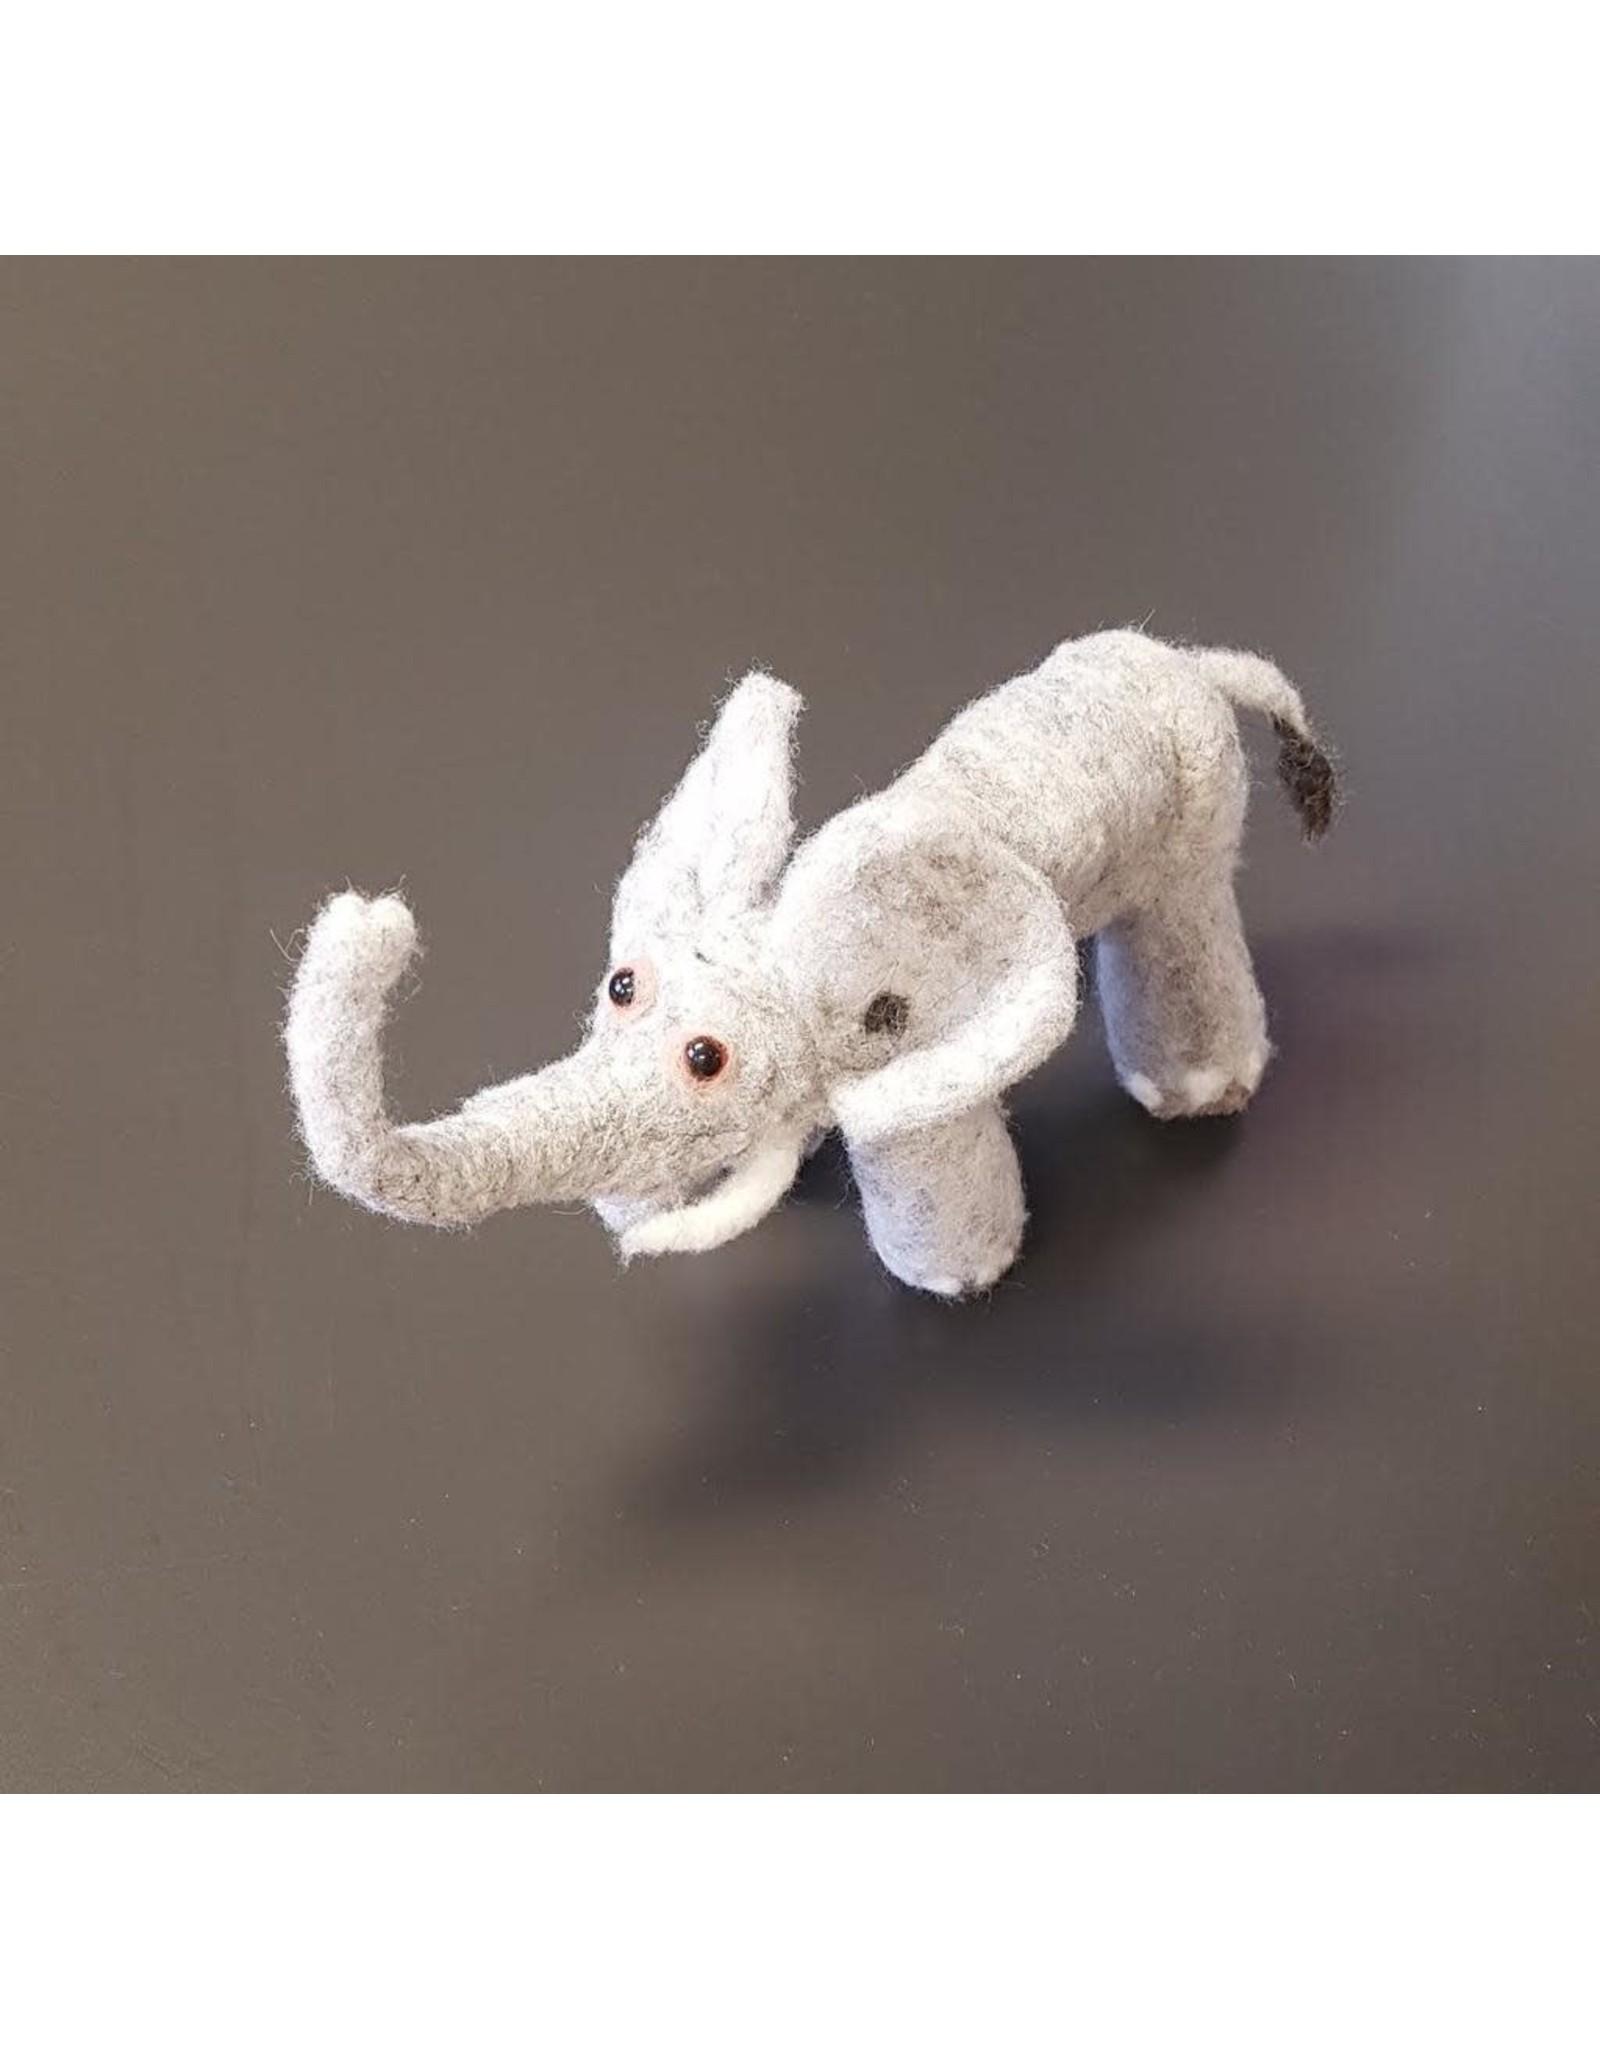 Dzama, Jeanette & Maurice Light Gray Elephant, Needle Felted Animal by Jeanette and Maurice Dzama